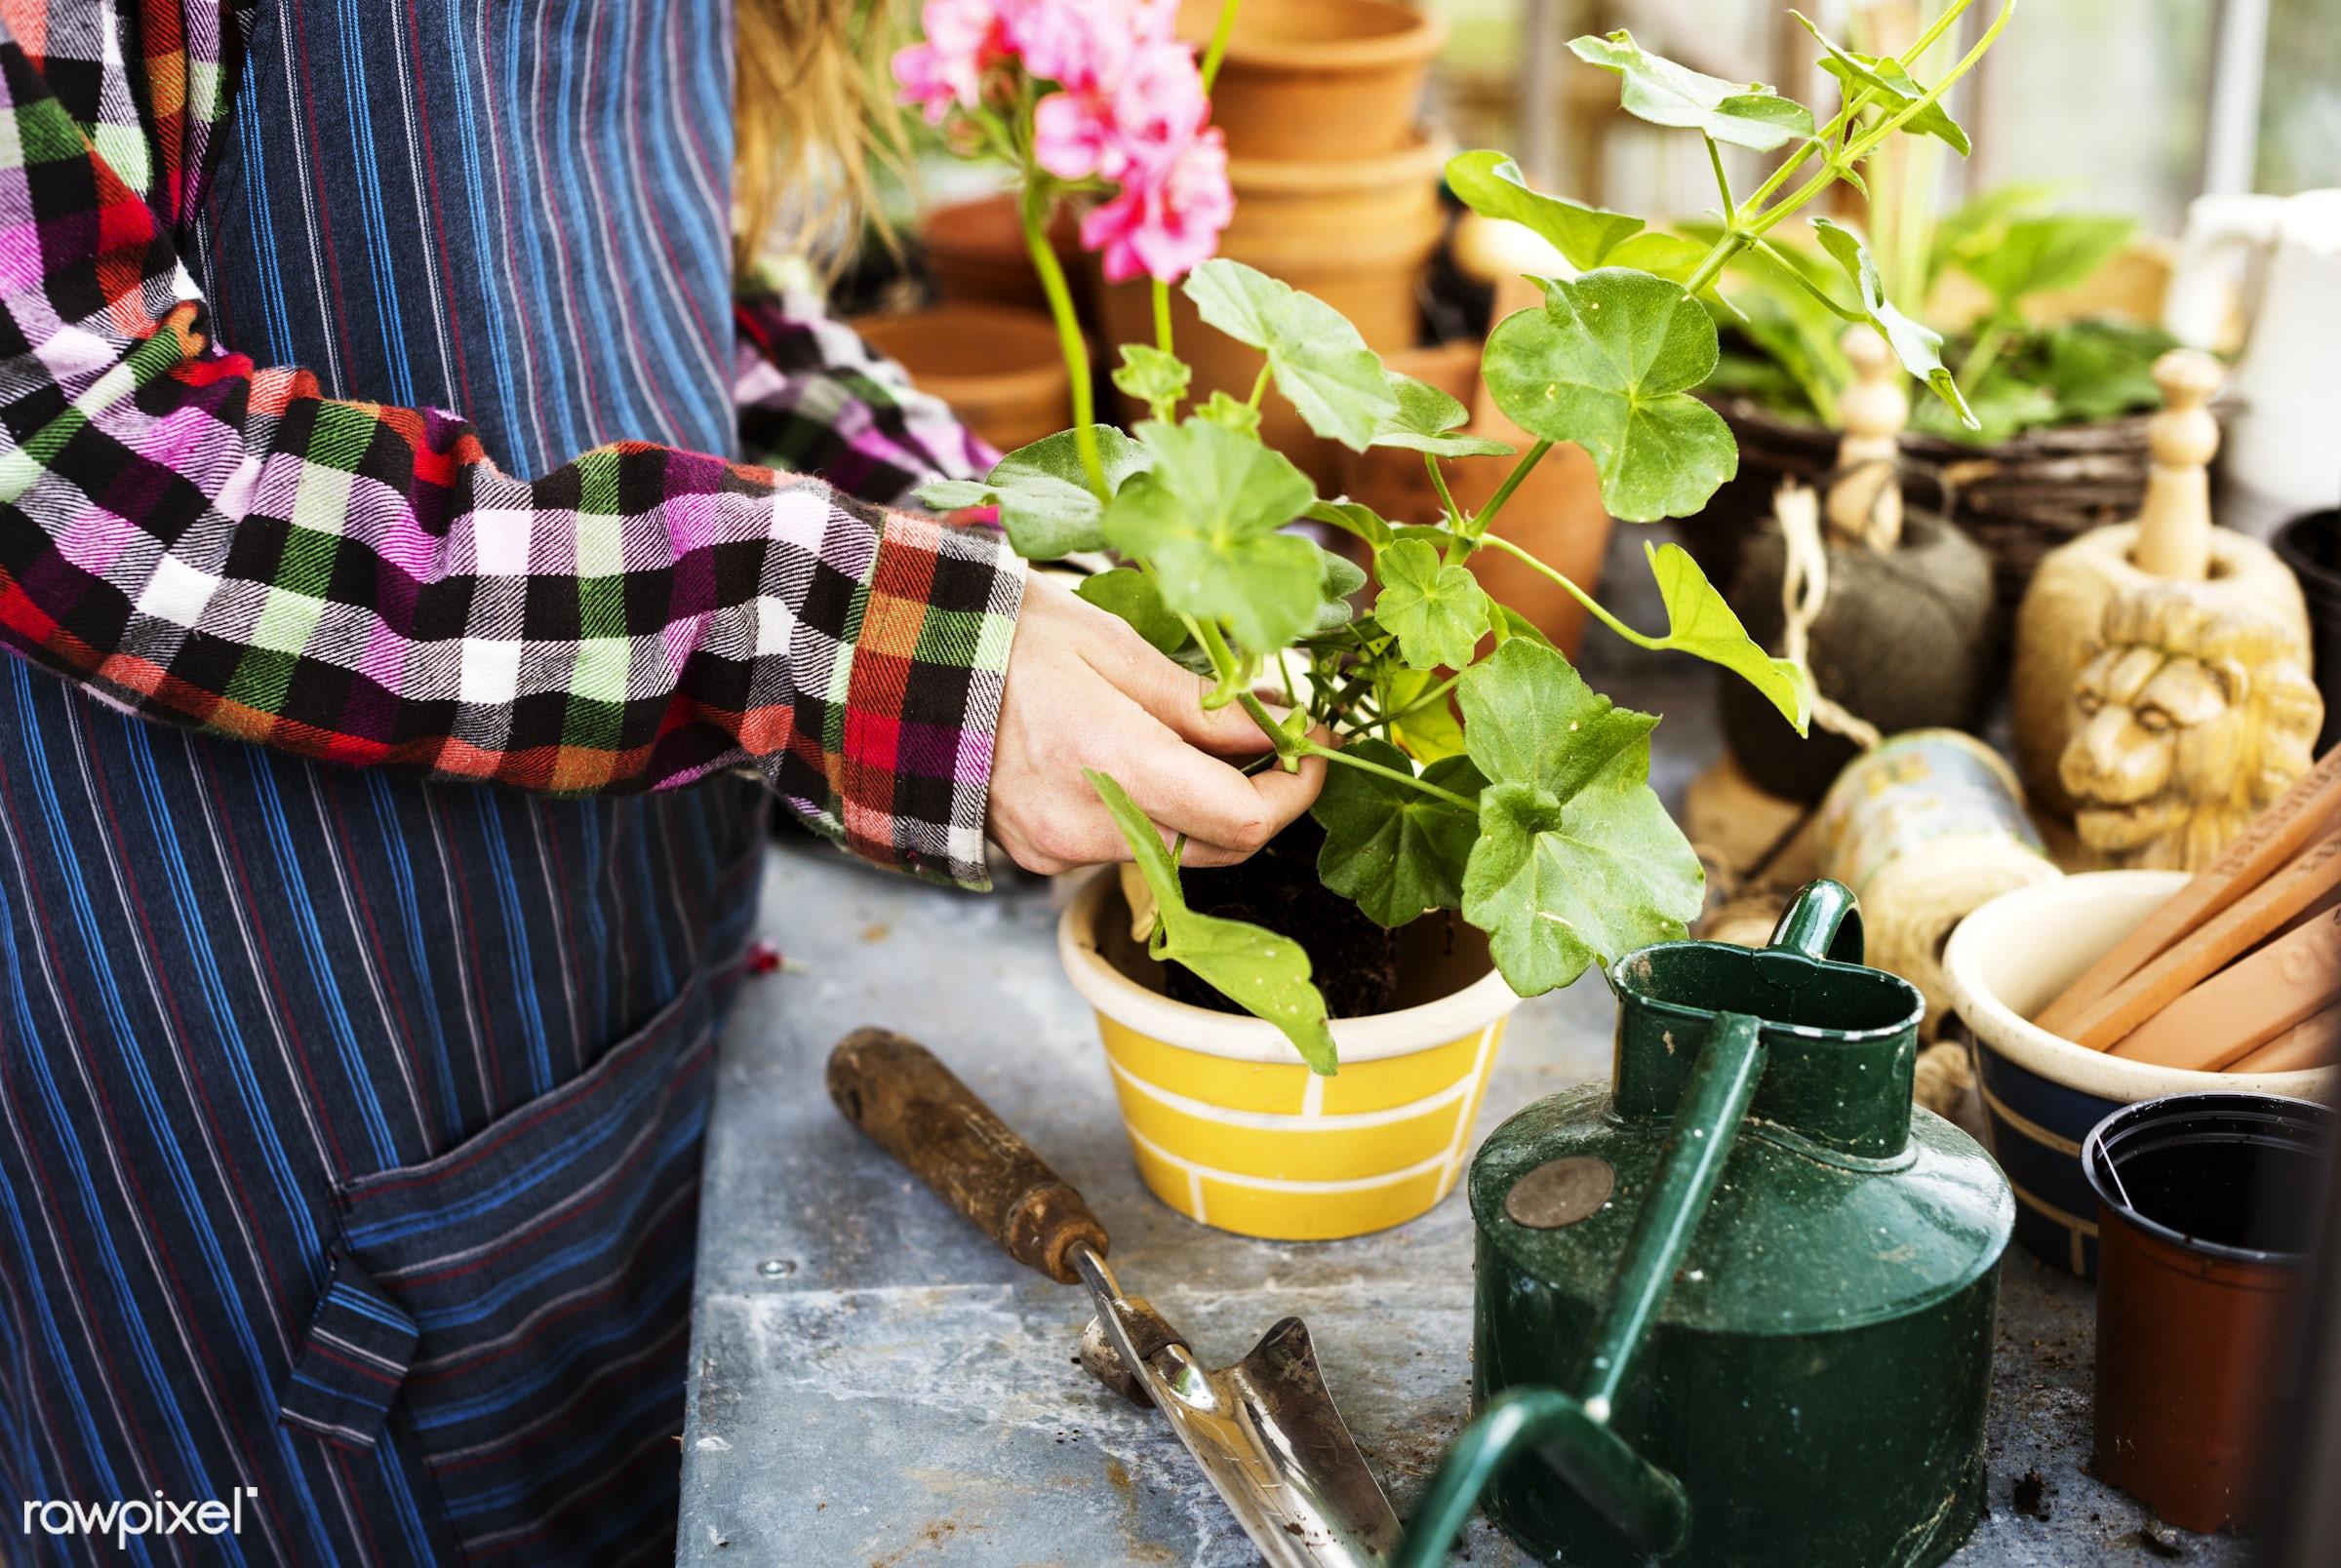 agriculture, arboretum, backyard, bloom, botanical, botany, cultivate, cultivated, cultivating, cultivation, ecology,...